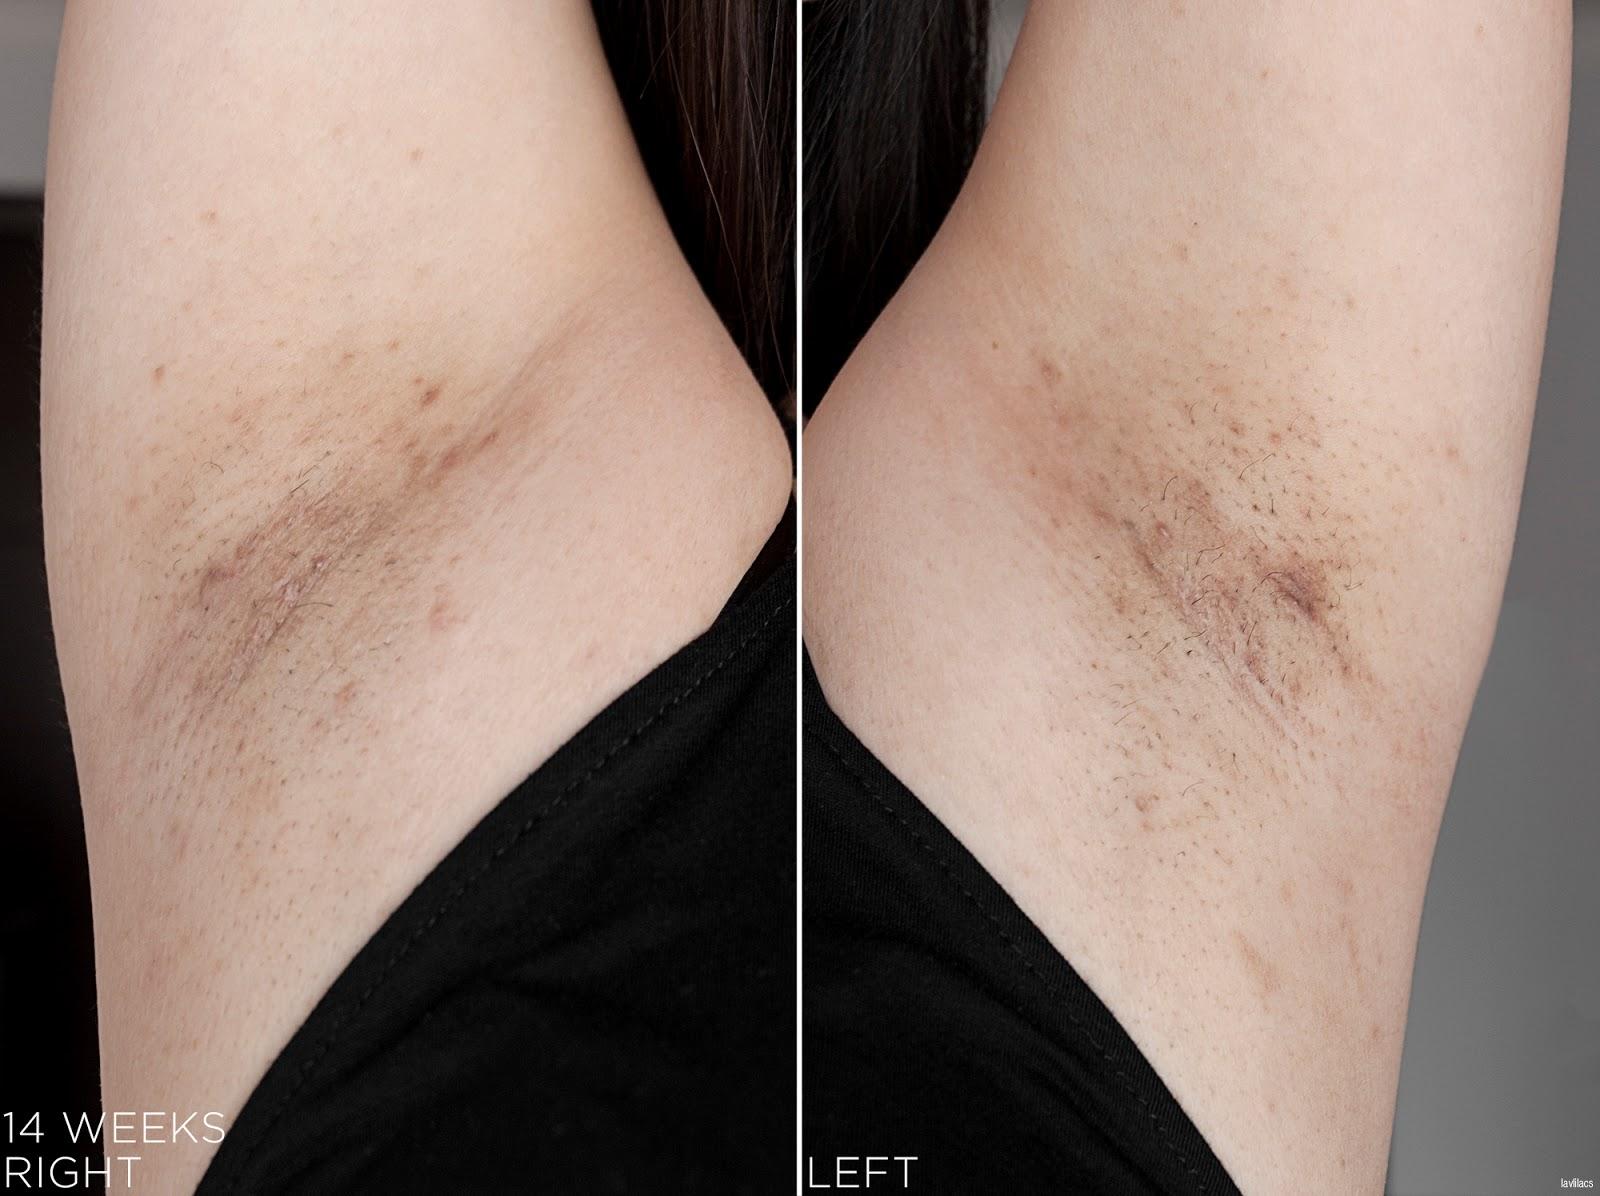 tria Hair Removal Laser Armpits Hair 14 Weeks, 3 months